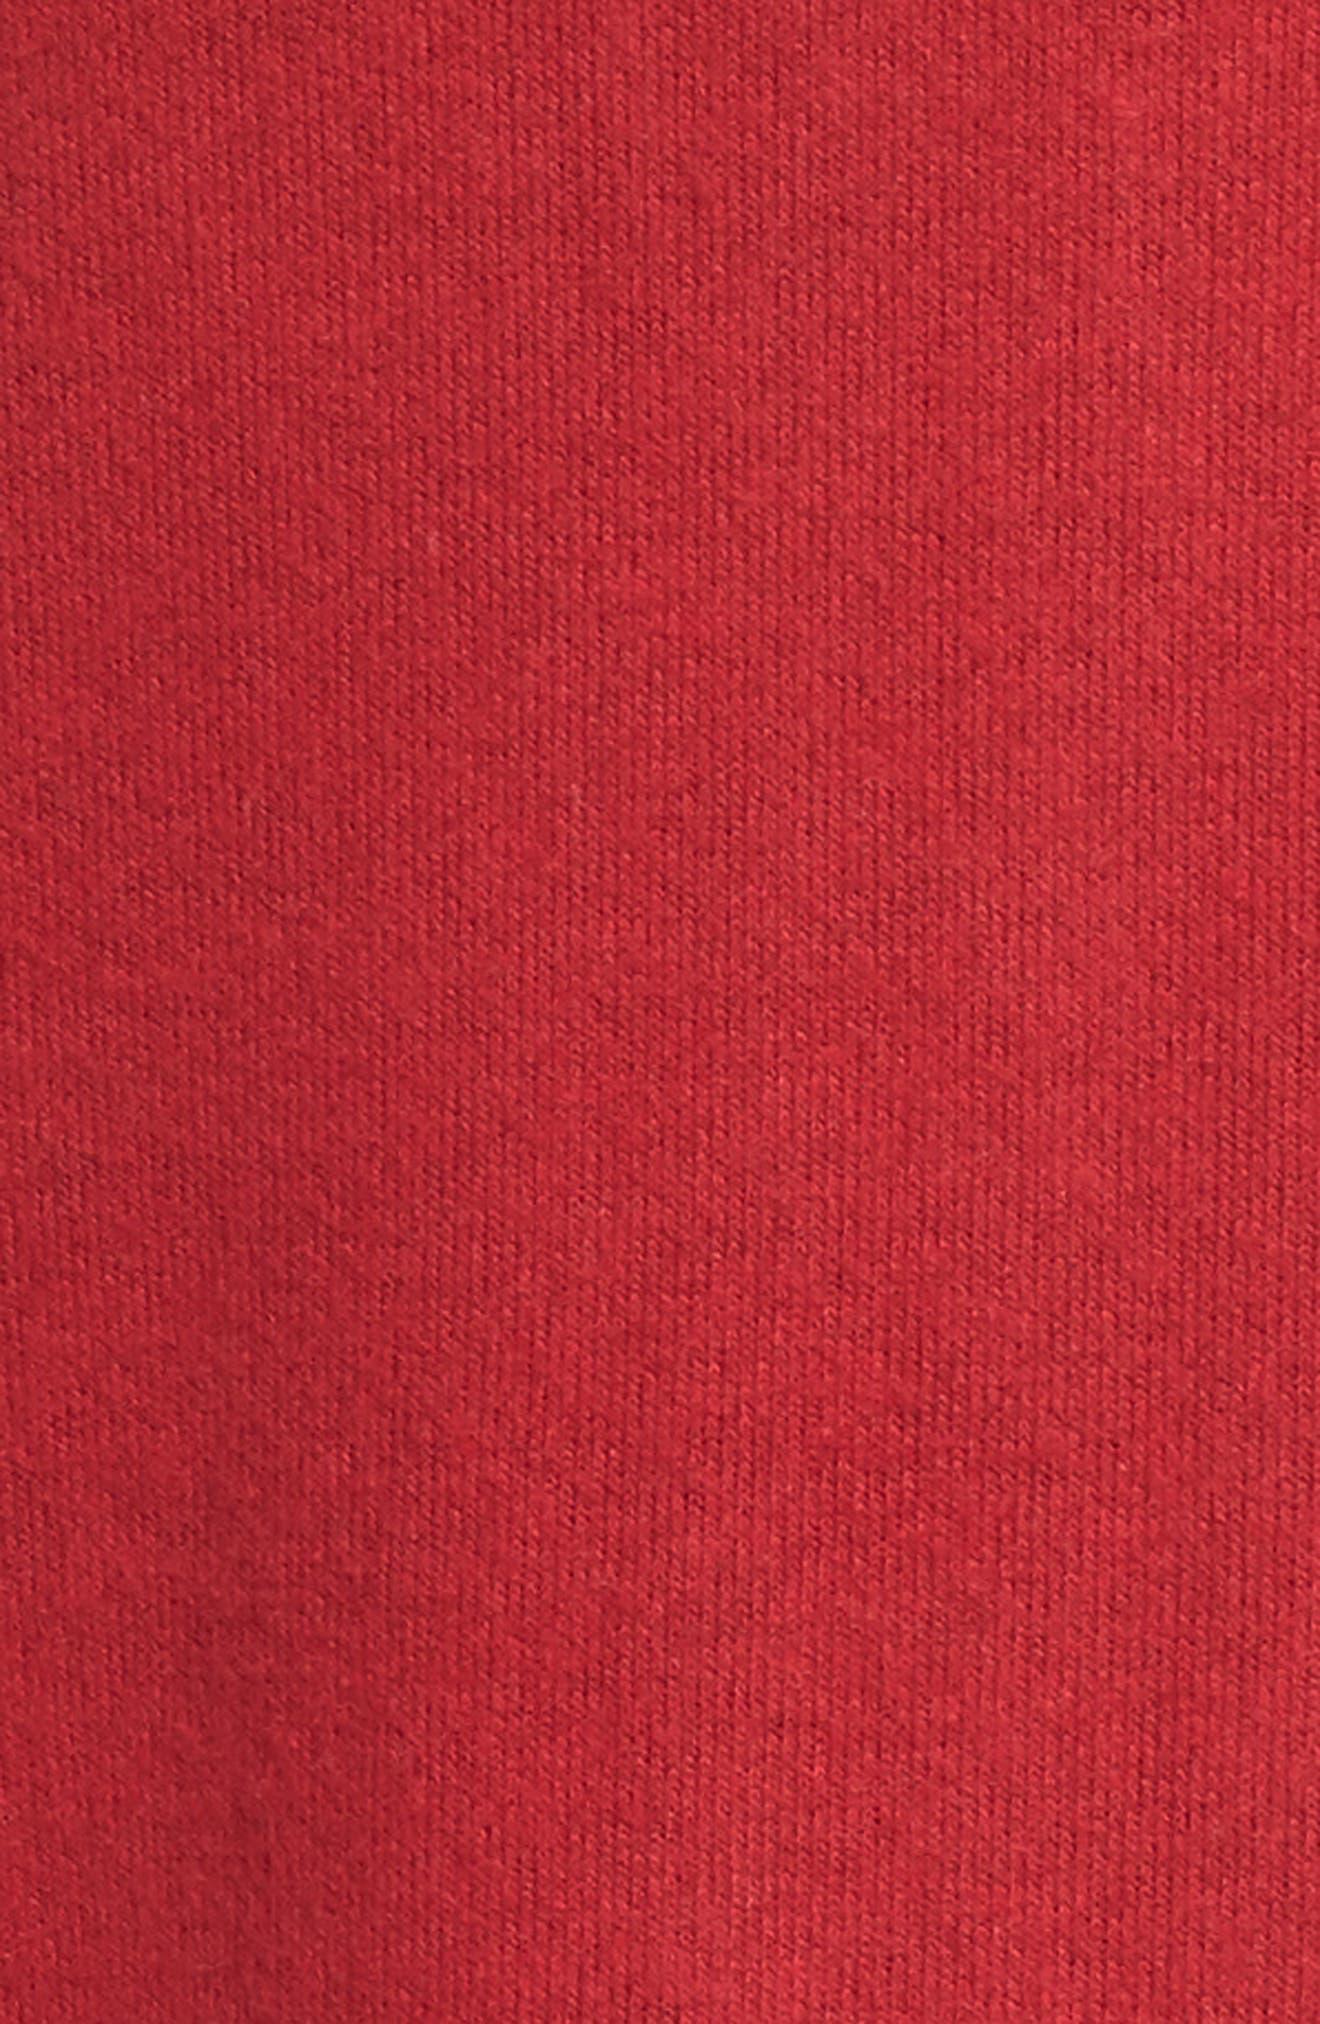 Convertible Neckline Cozy Tunic,                             Alternate thumbnail 25, color,